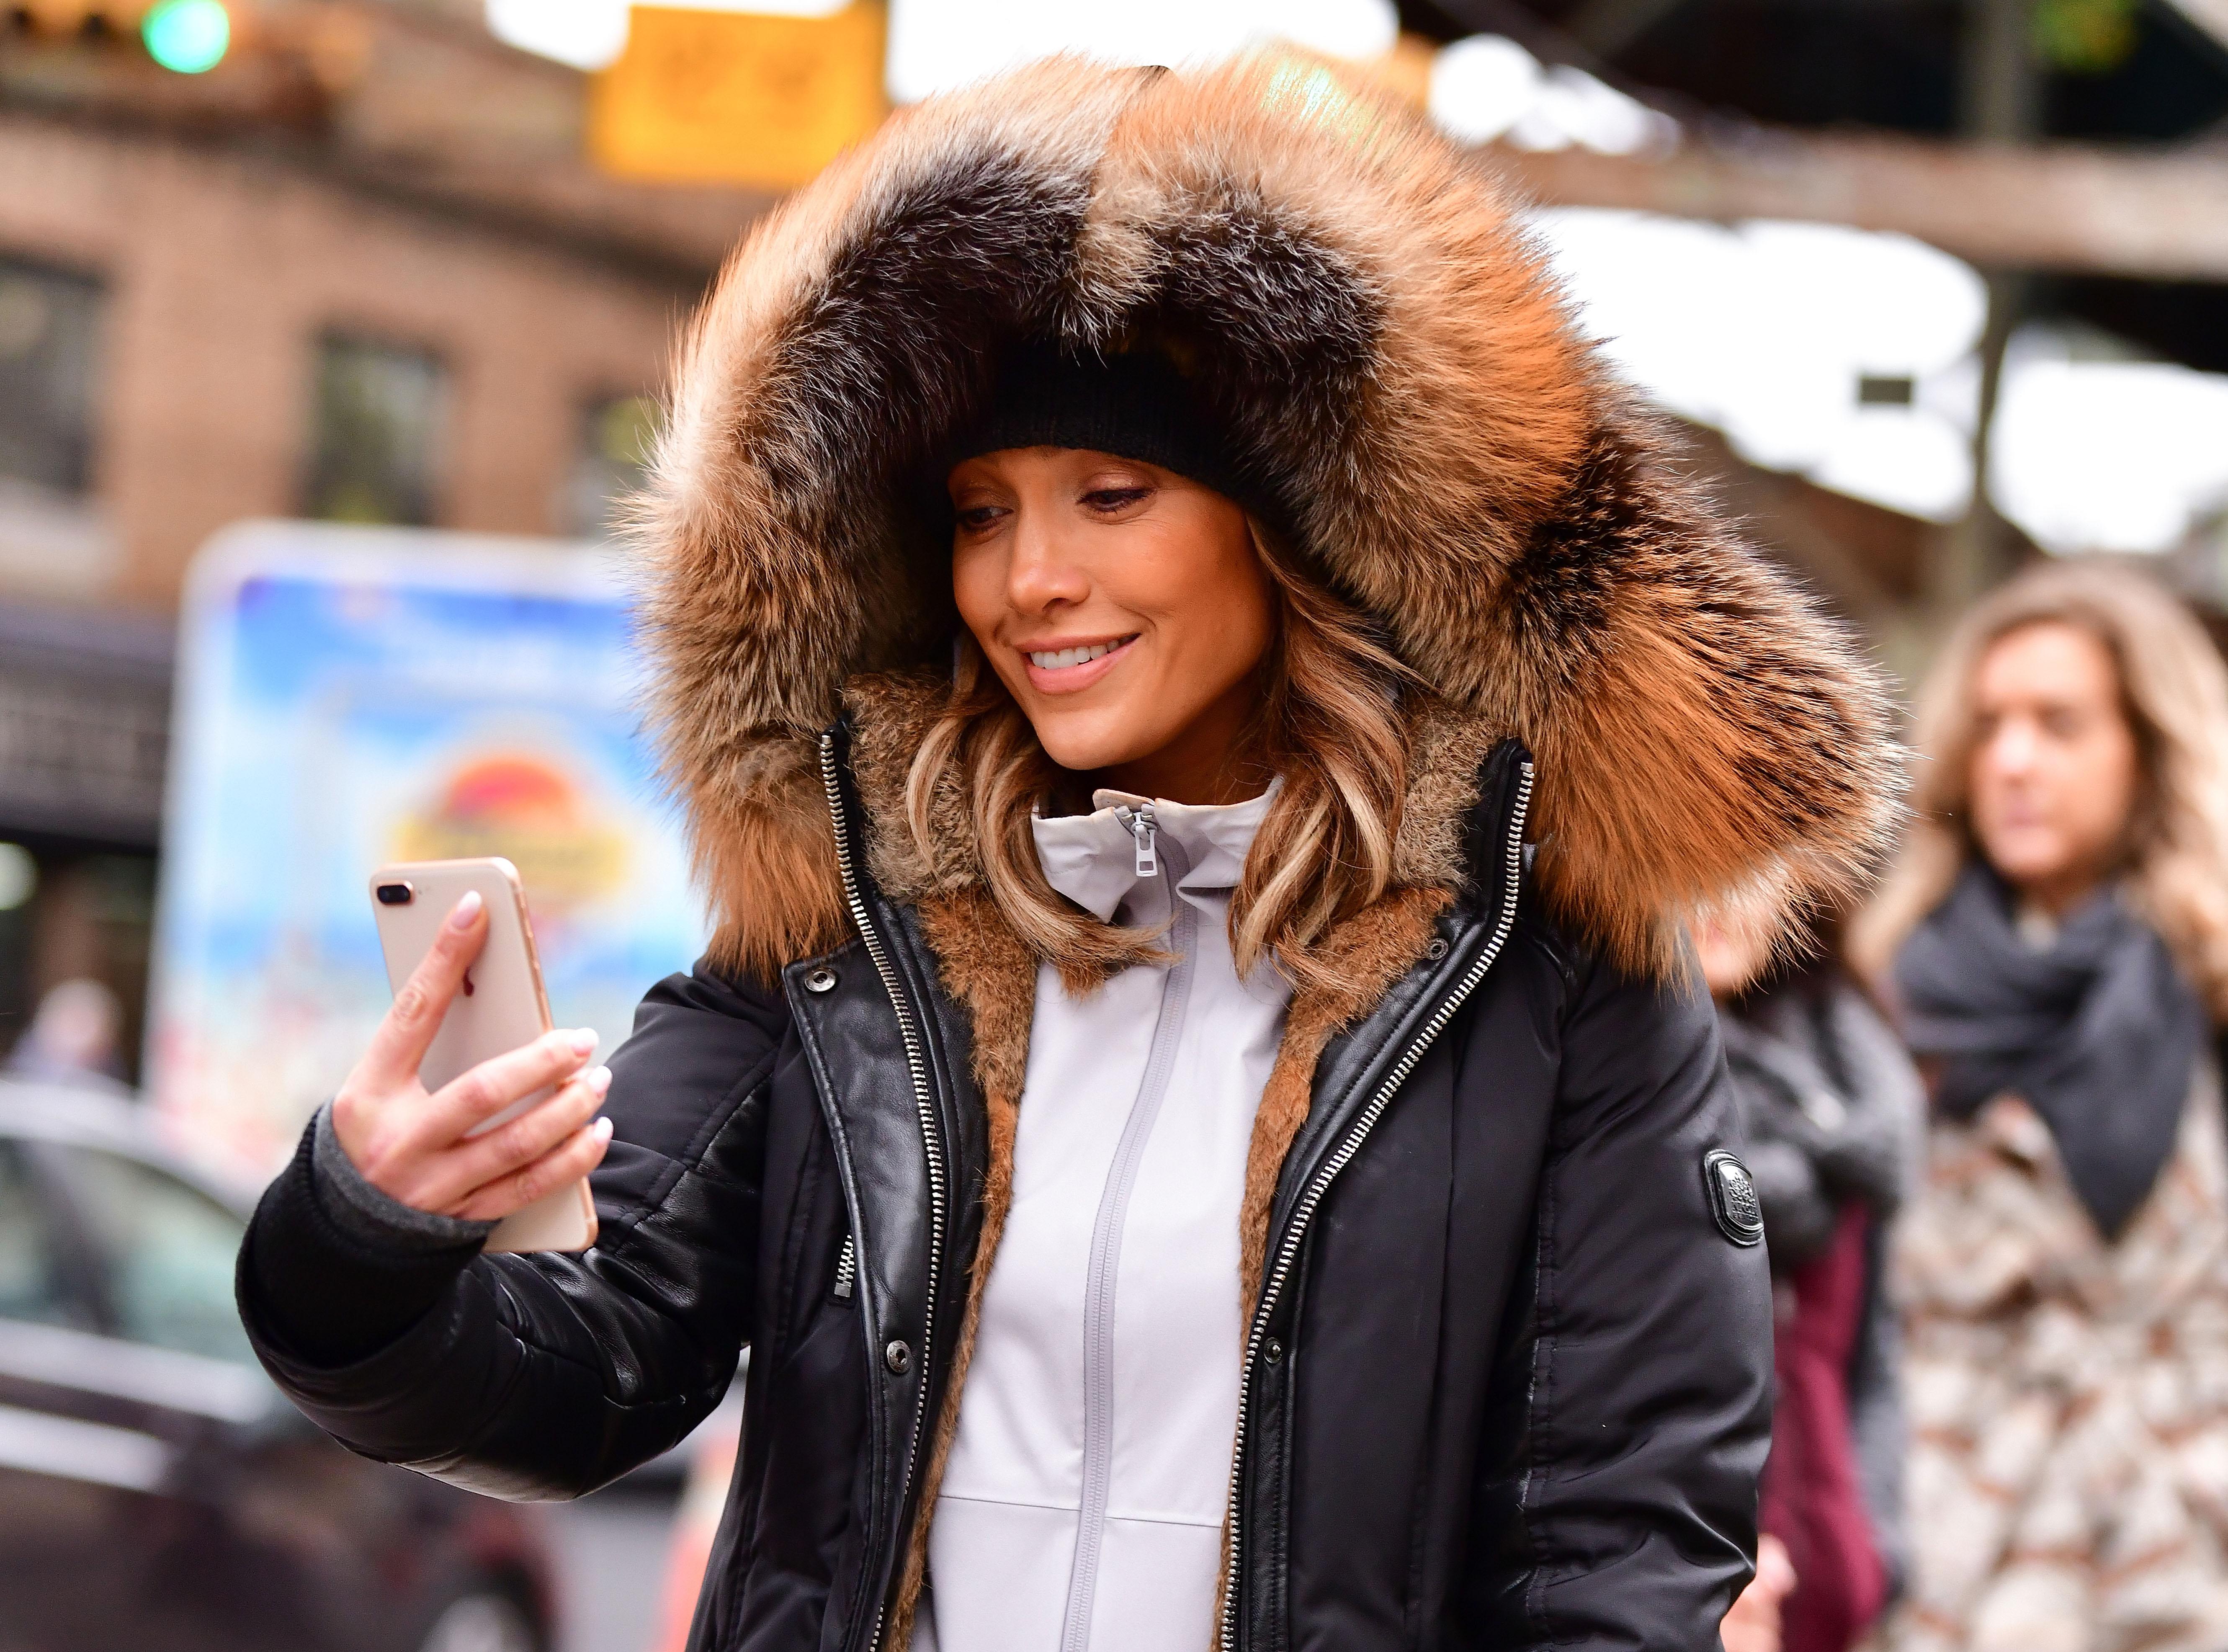 Celebrity Sightings in New York City - November 7, 2017